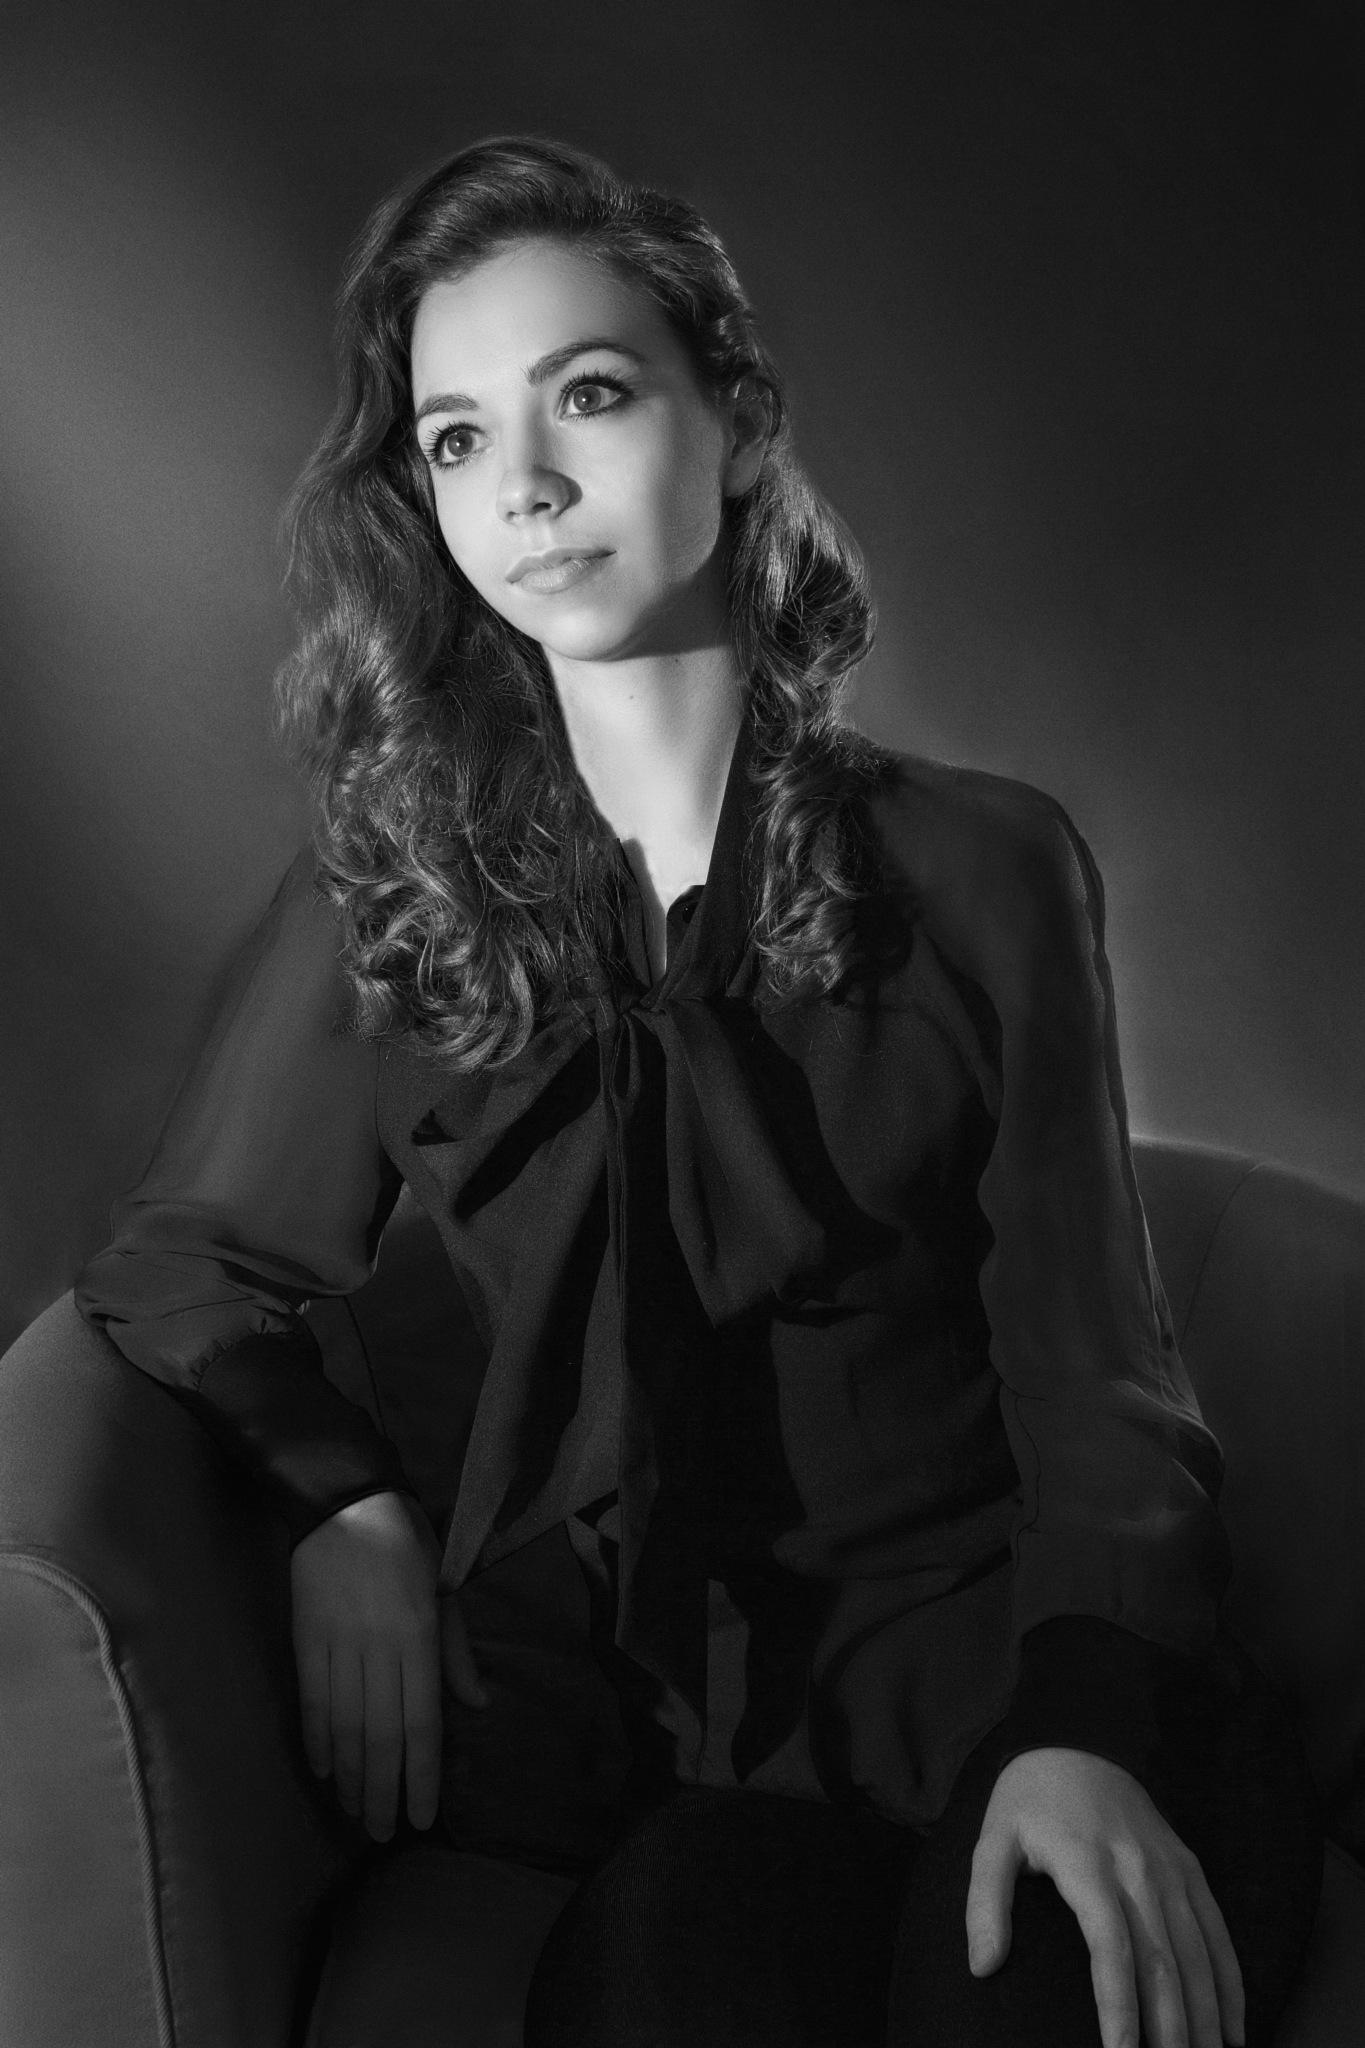 Classica. Alina, an actress. by Anita Lazareva